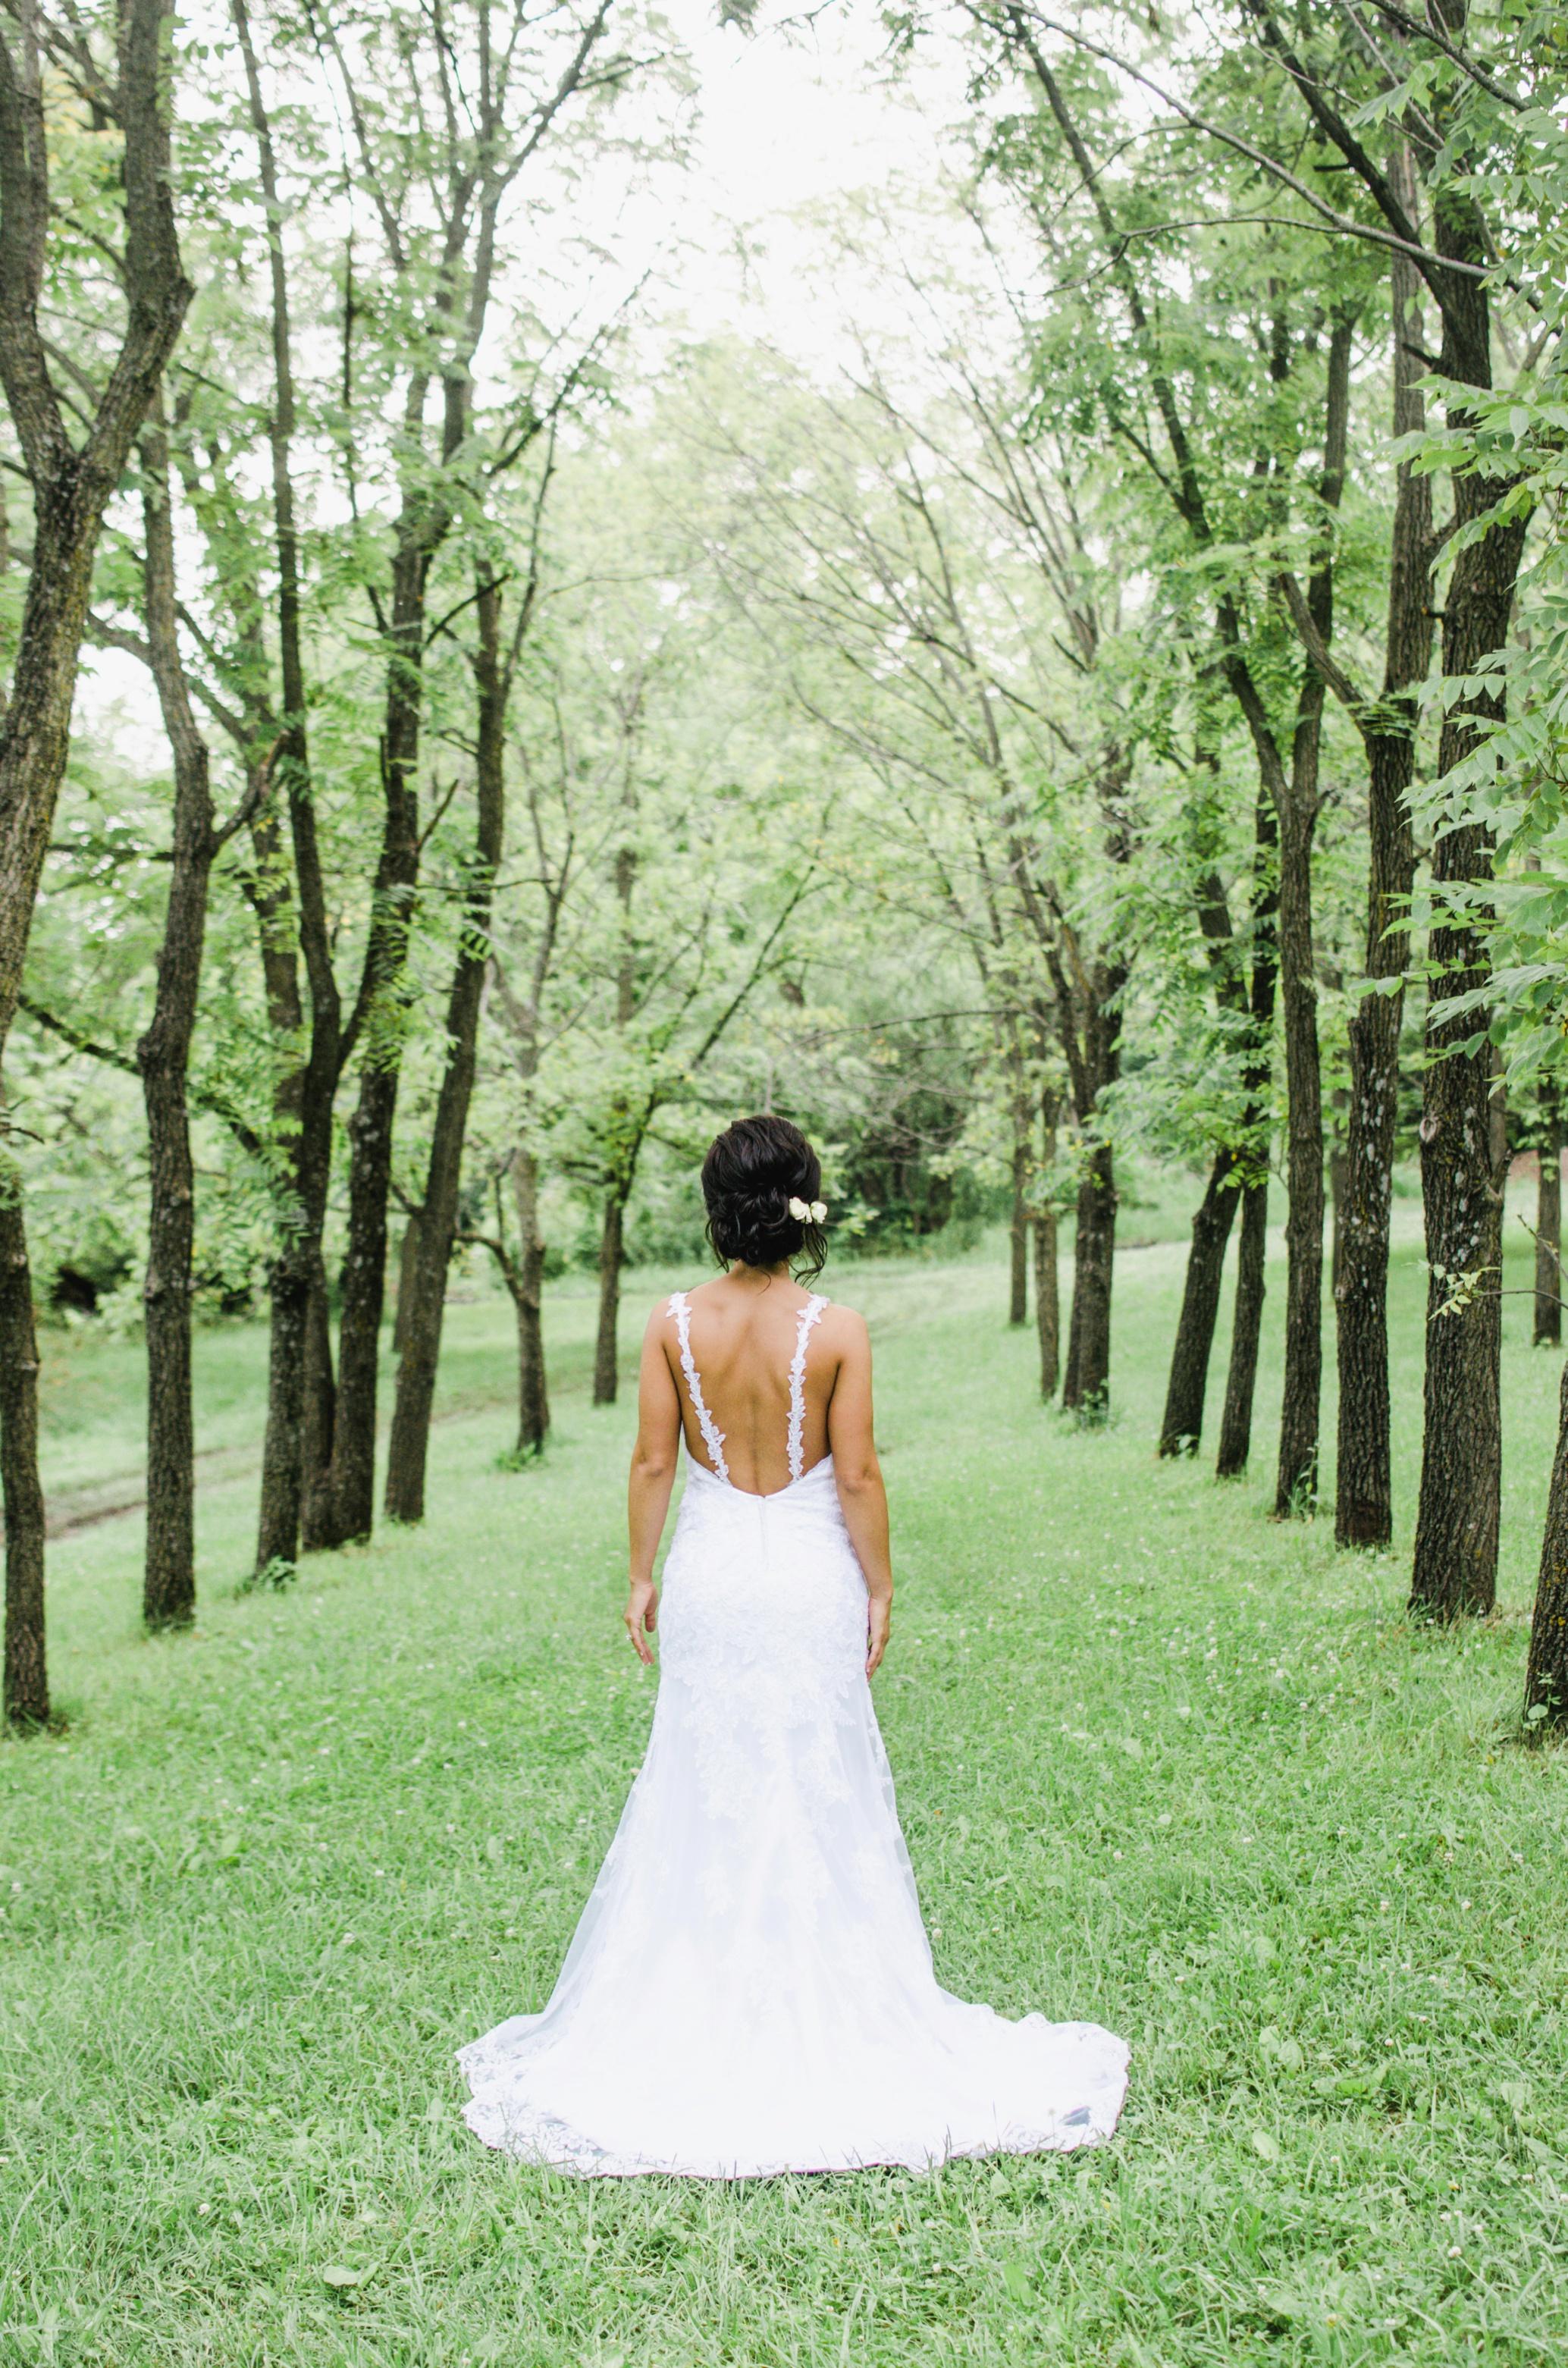 Barnes' Place Rustic Outdoor Wedding | Ali Leigh Photo Minneapolis Wedding Photographer_0158.jpg